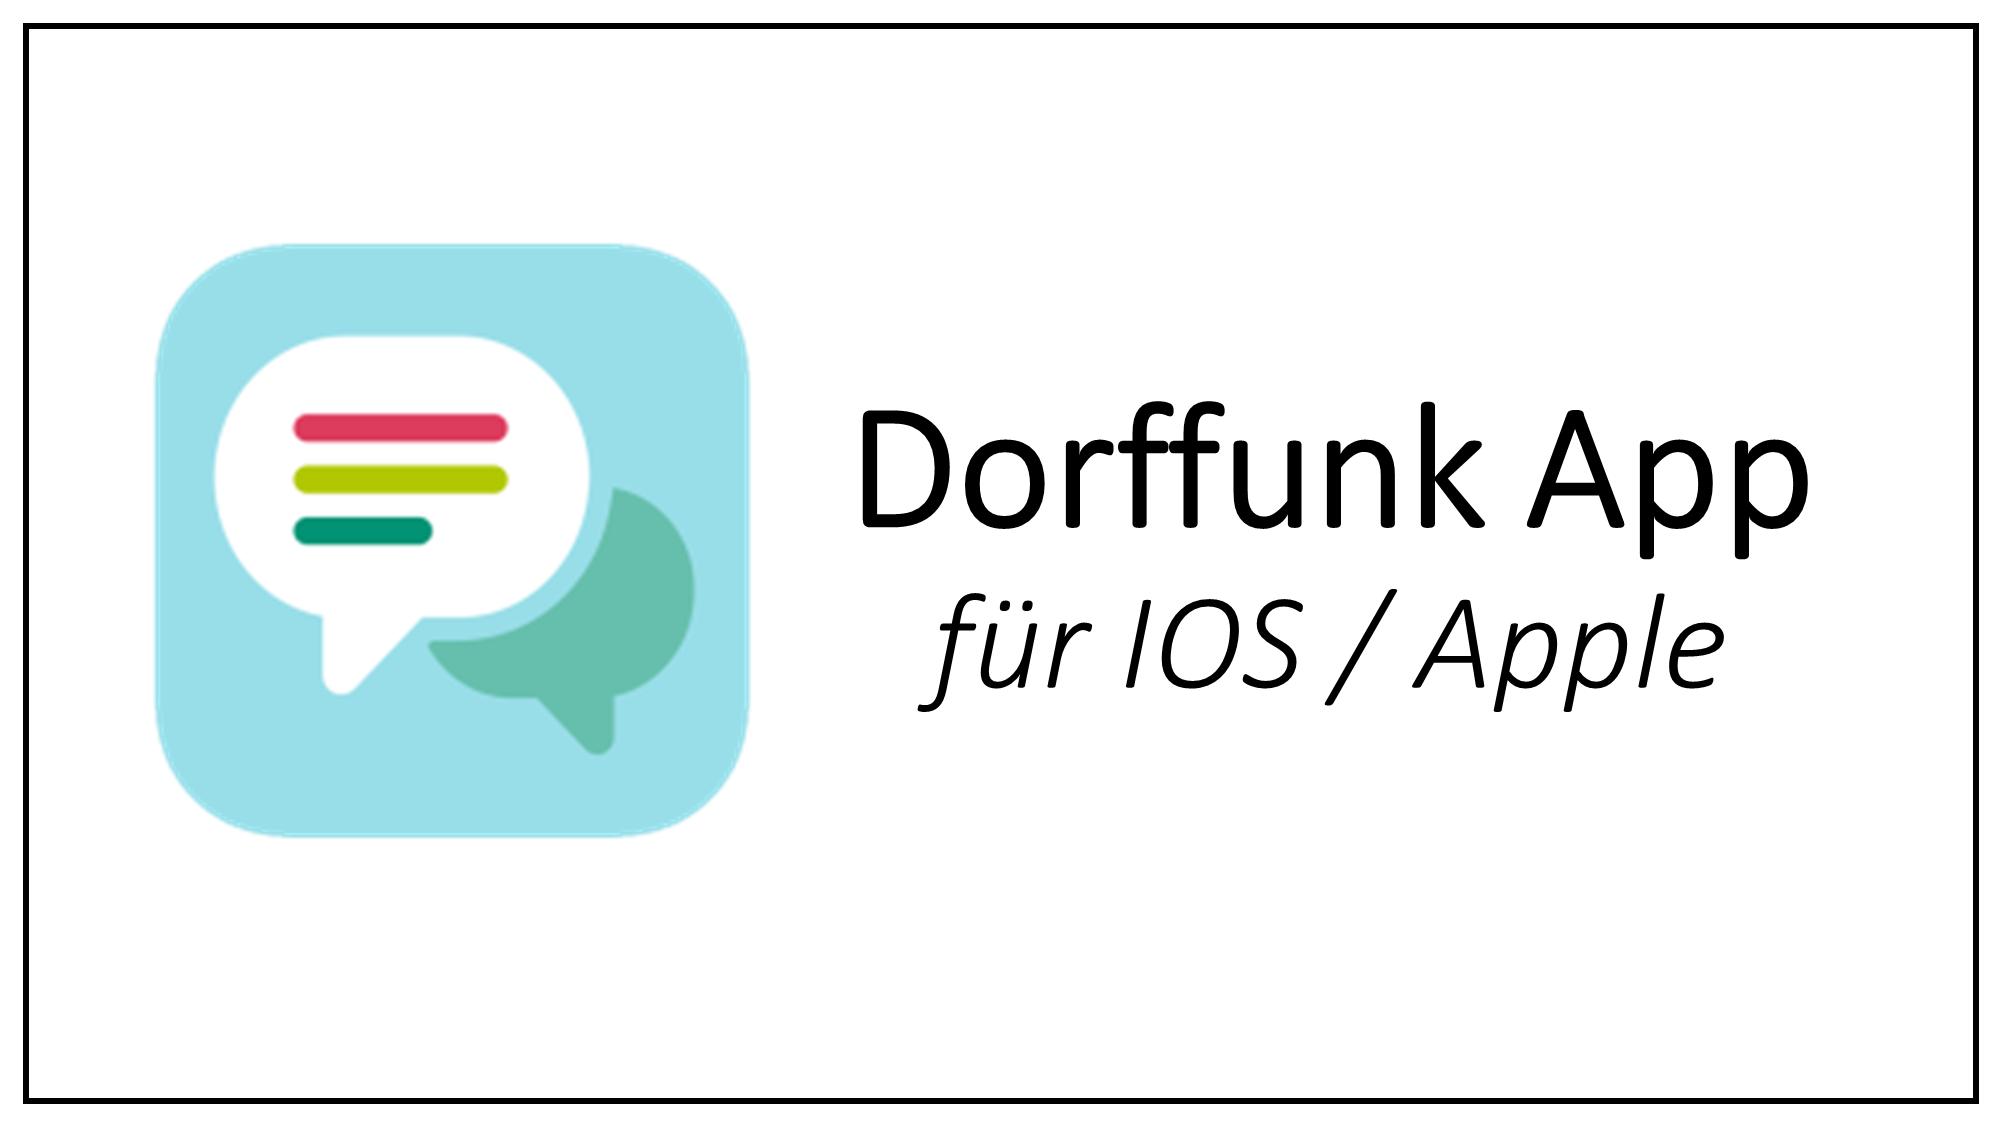 Dorffunk App für IOS Apple